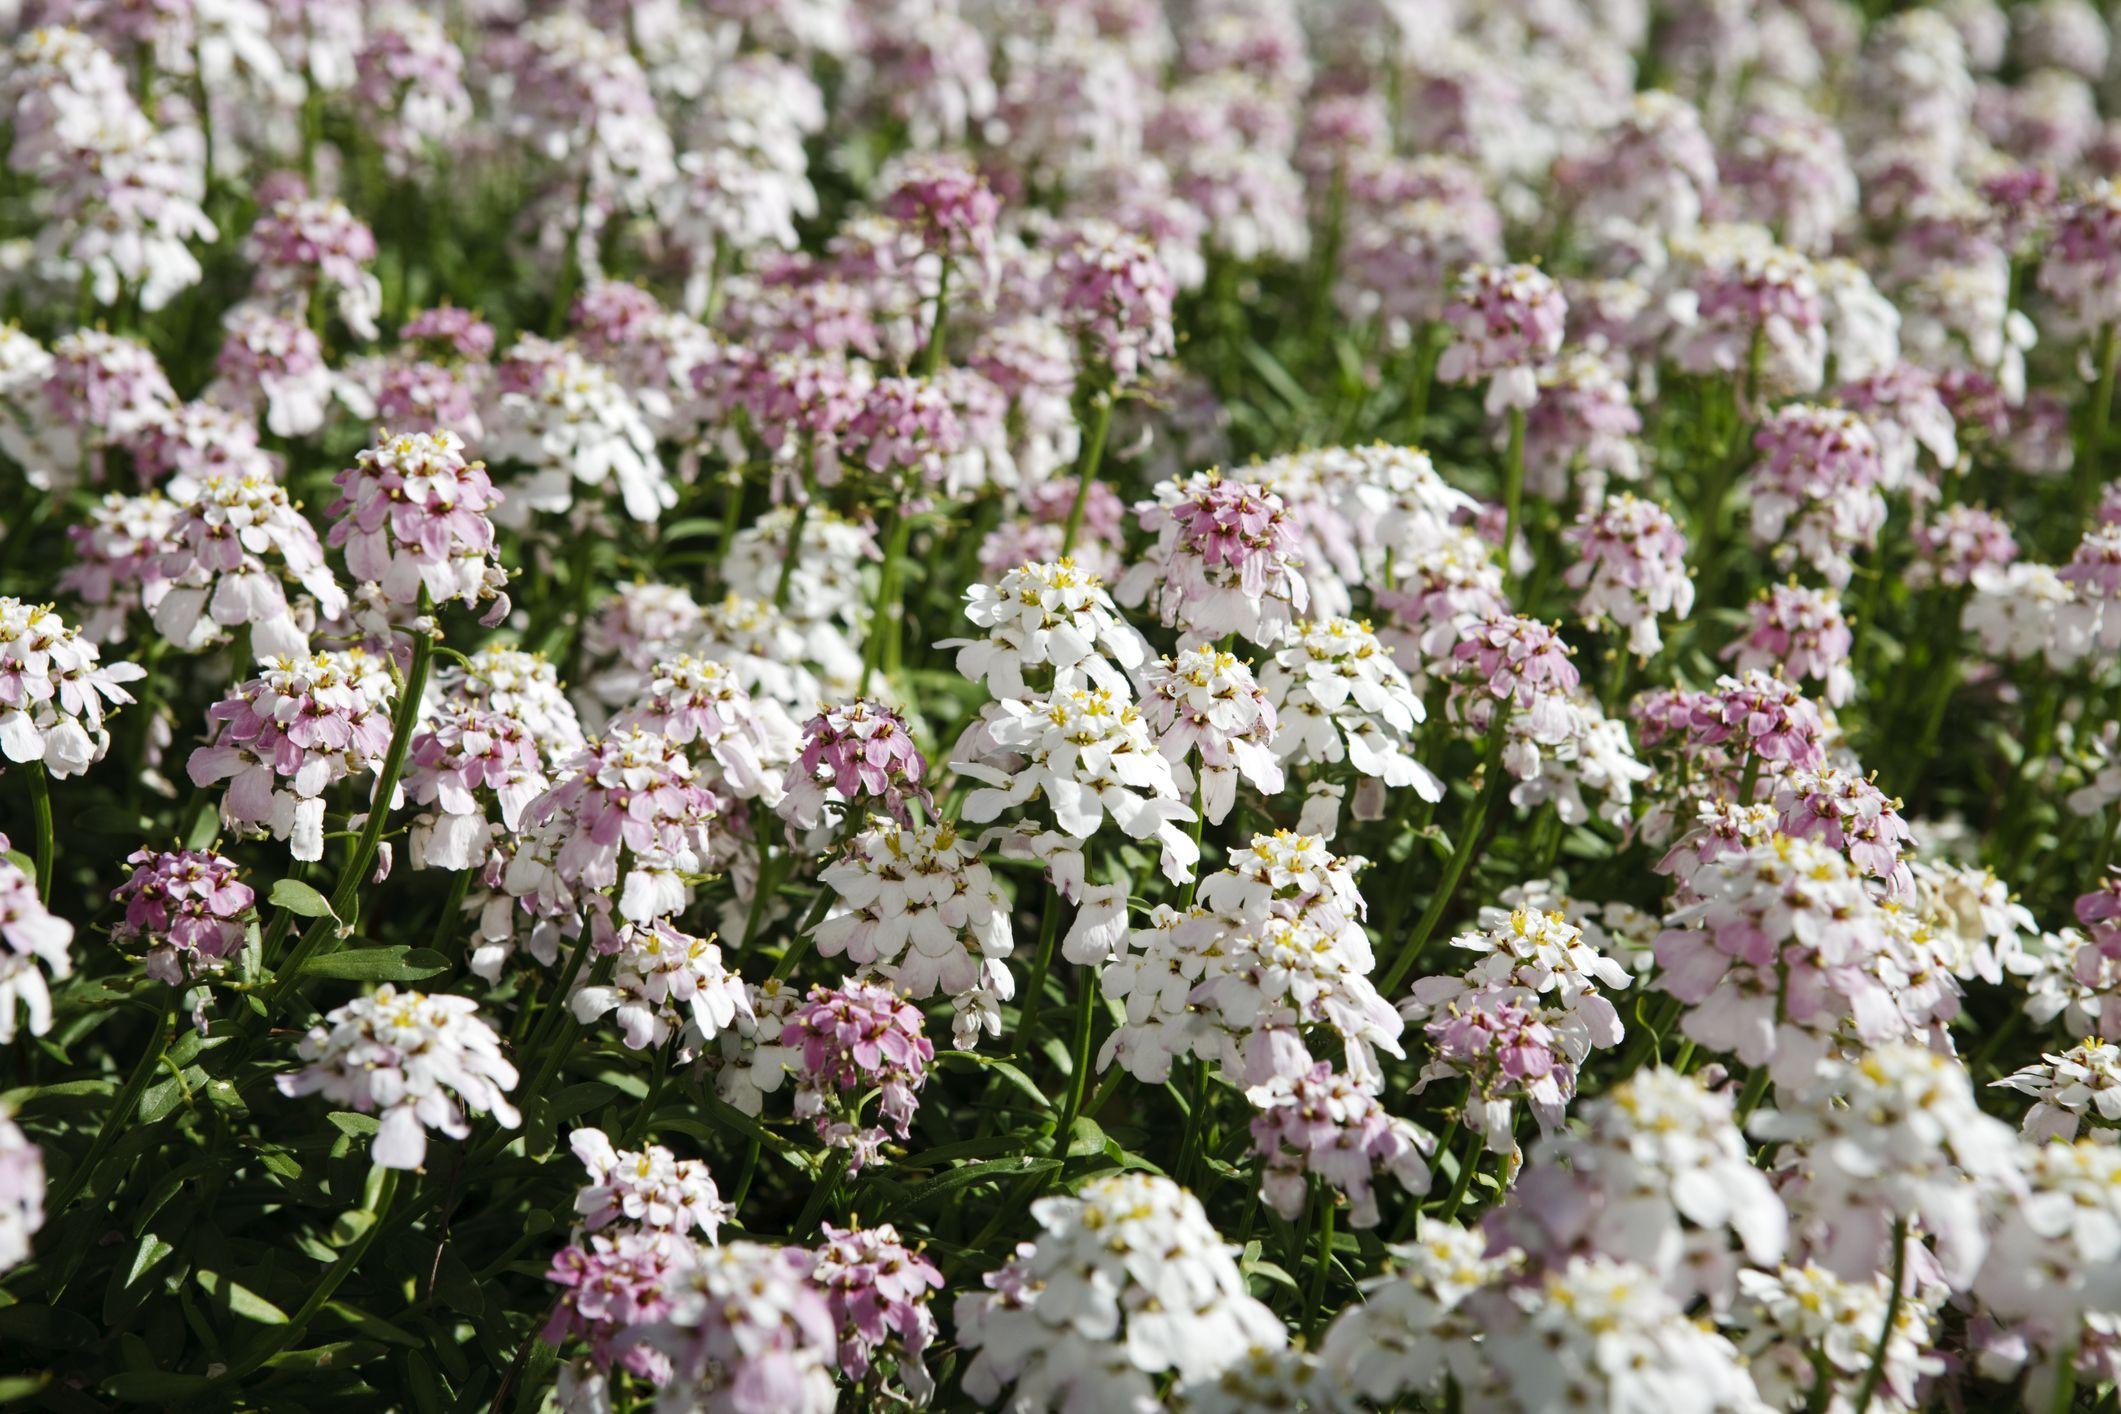 1 X PACHYSANDRA TERMINALIS VARIEGATA JAPANESE SPURGE EVERGREEN PLANT IN POT